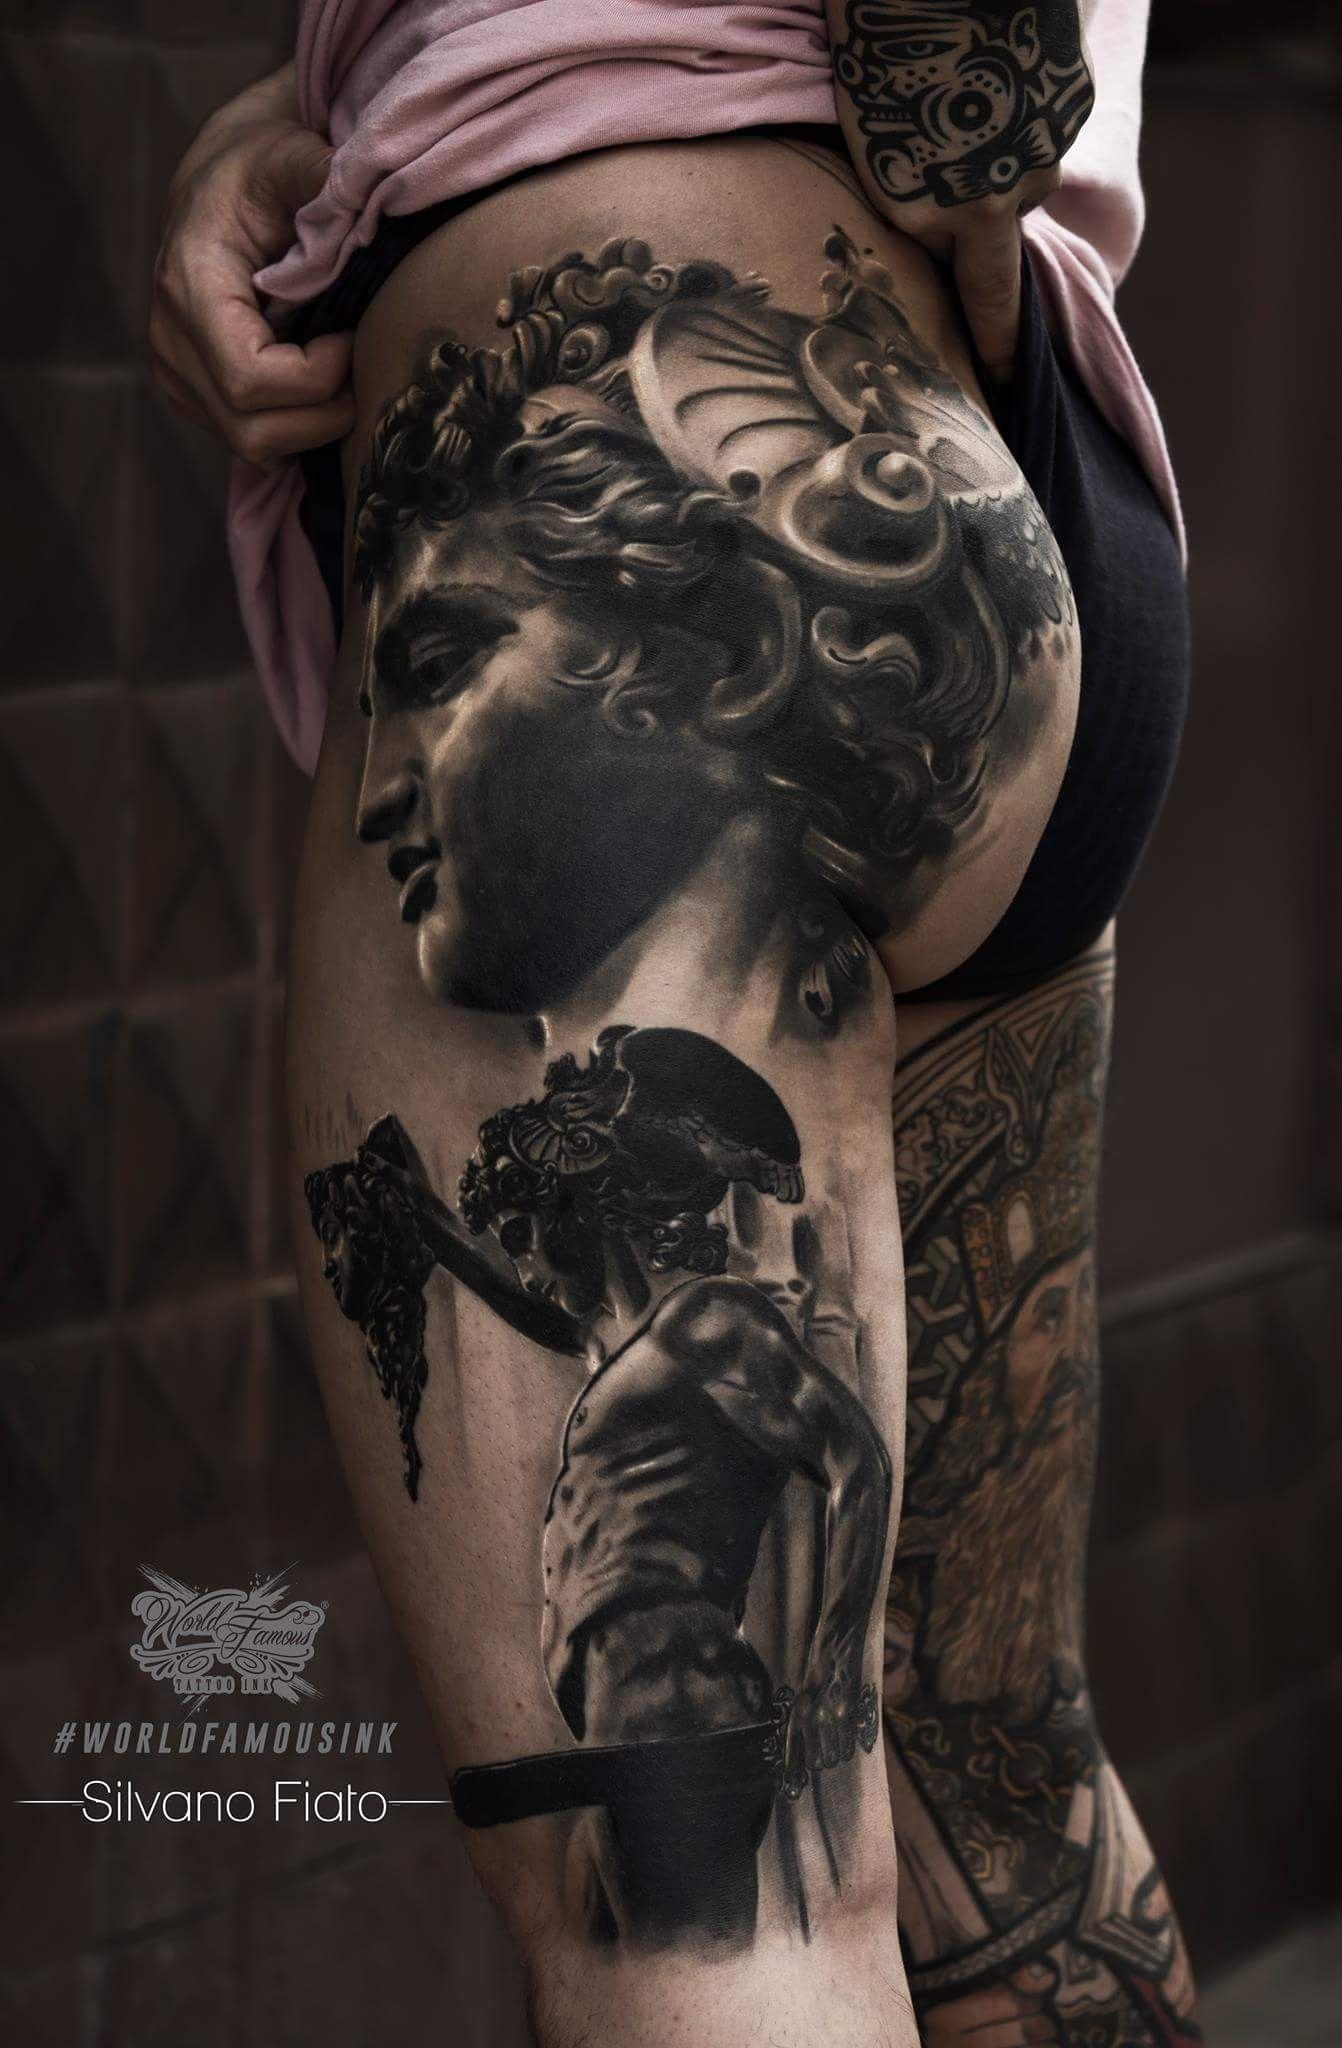 Image By Frank Roddy On Tattoo Artist Silvano Fiato World Famous